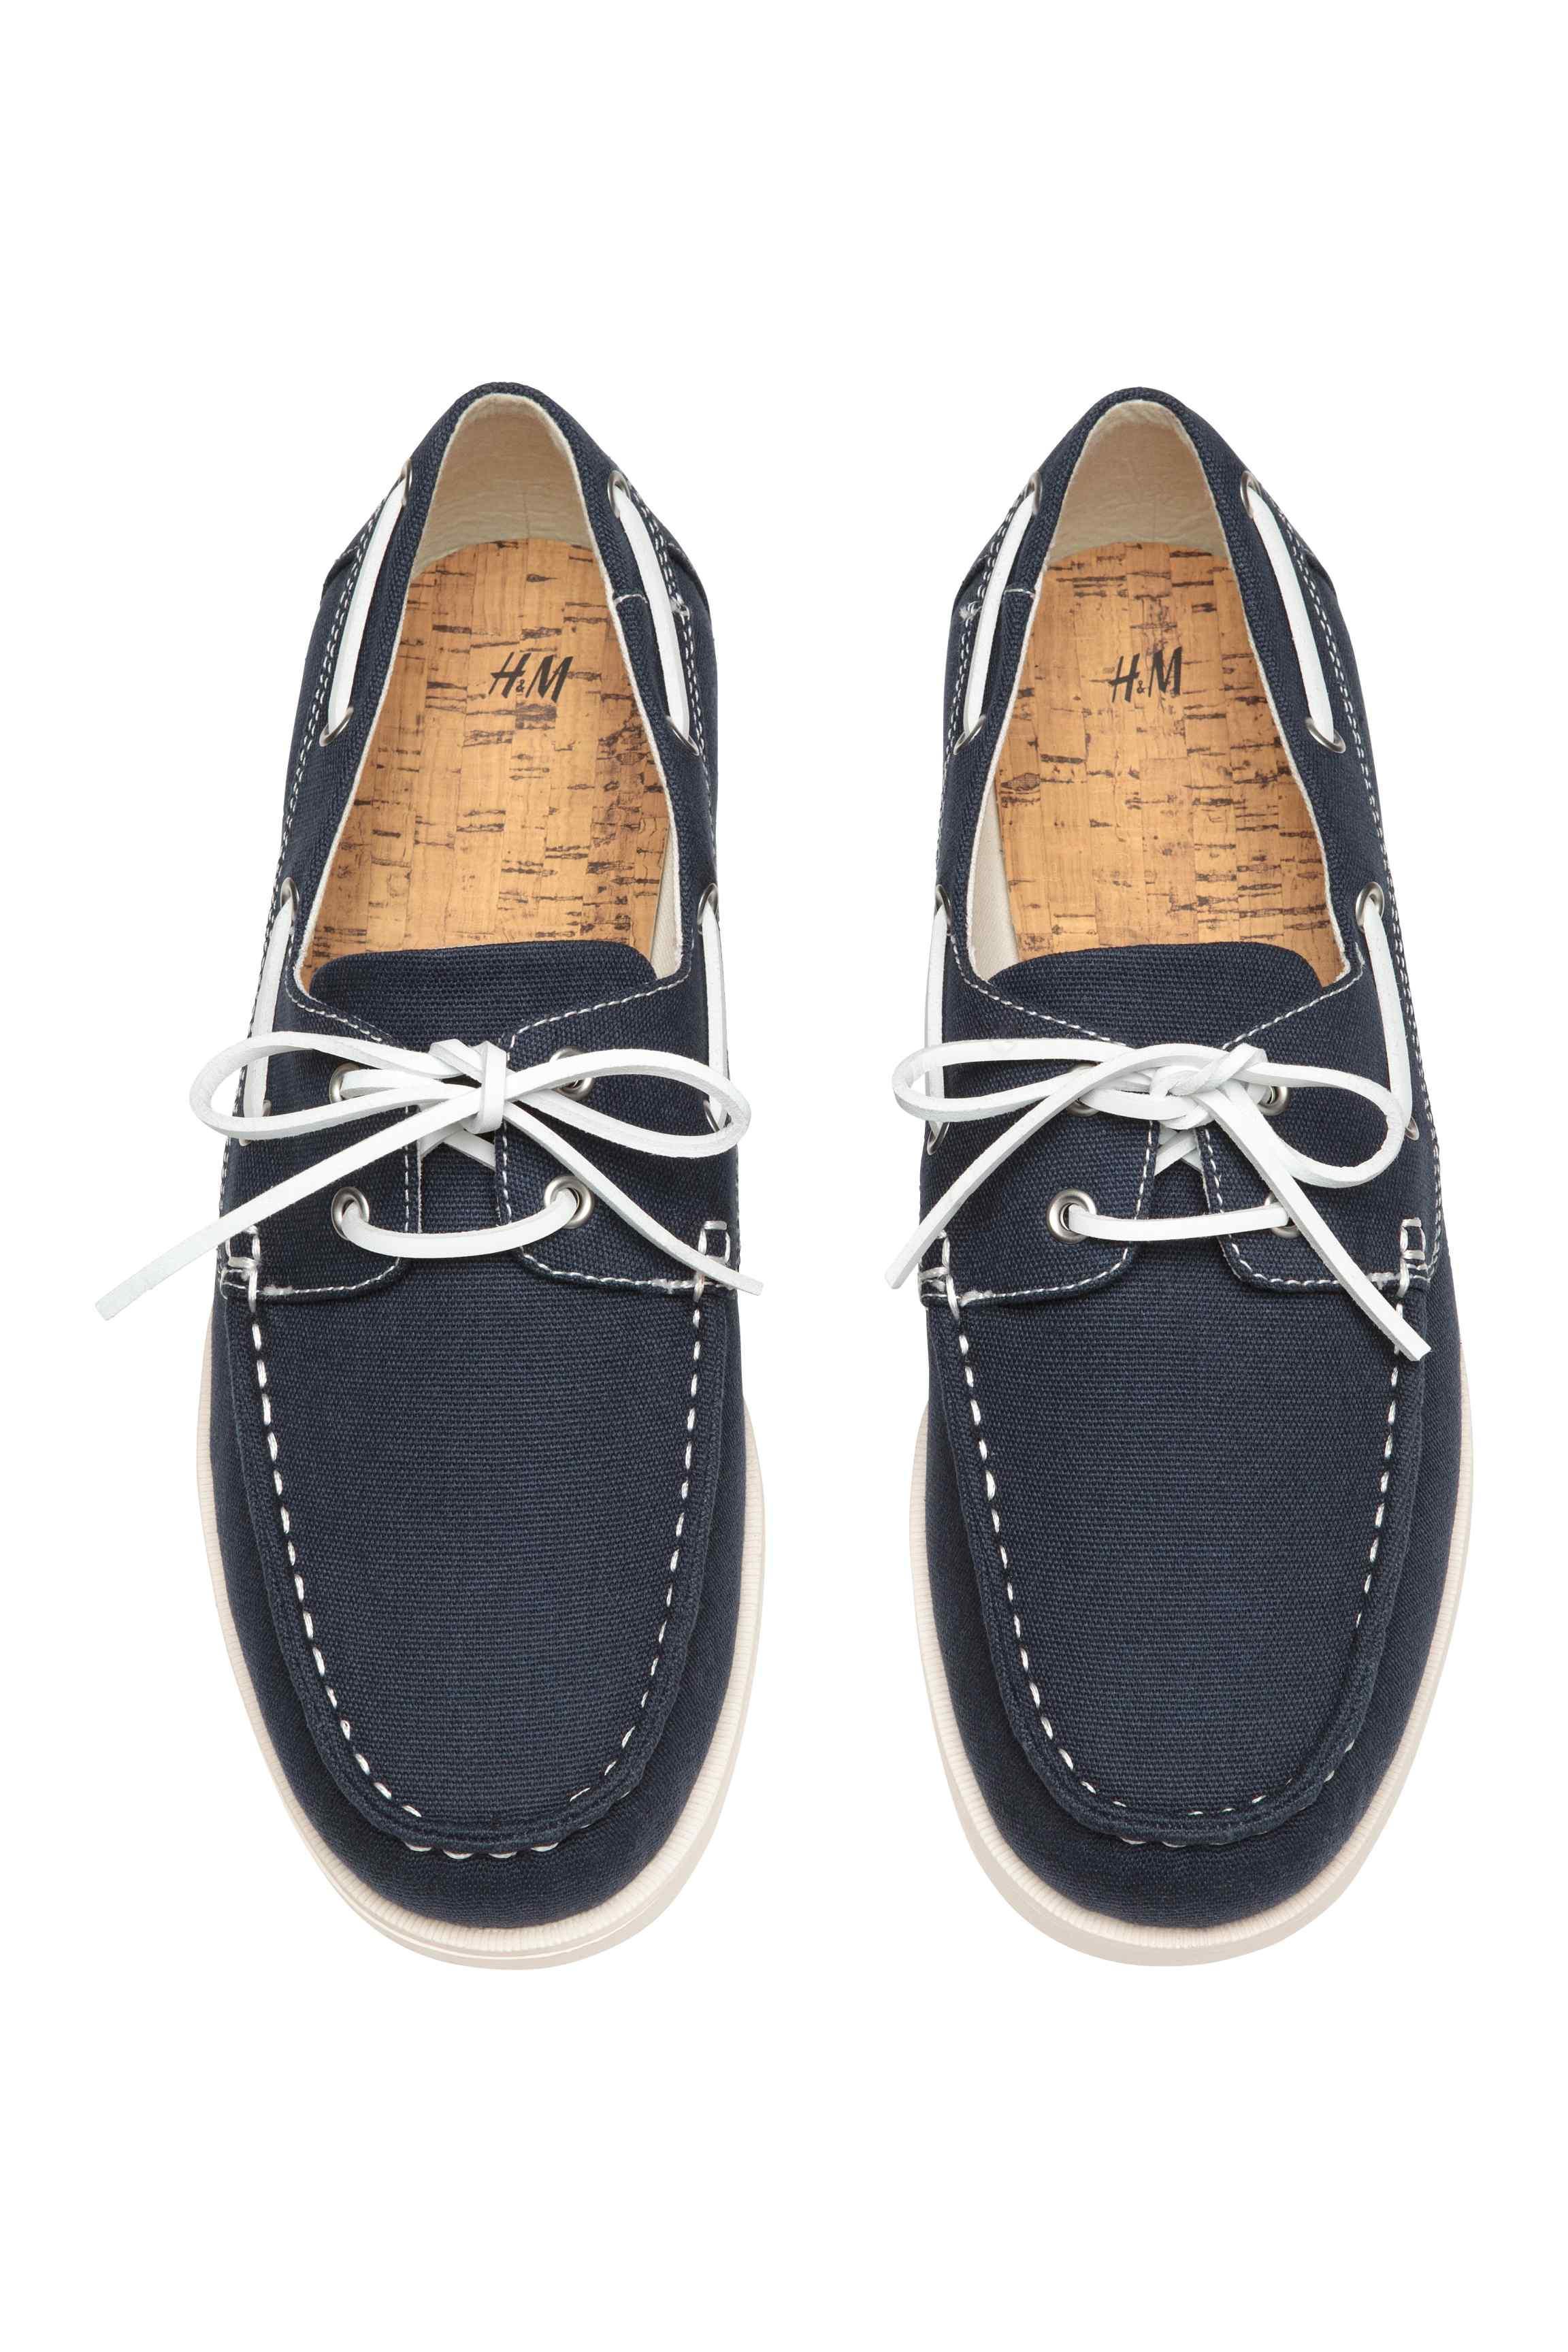 H&M Canvas Deck Shoes in Dark Blue (Blue) for Men